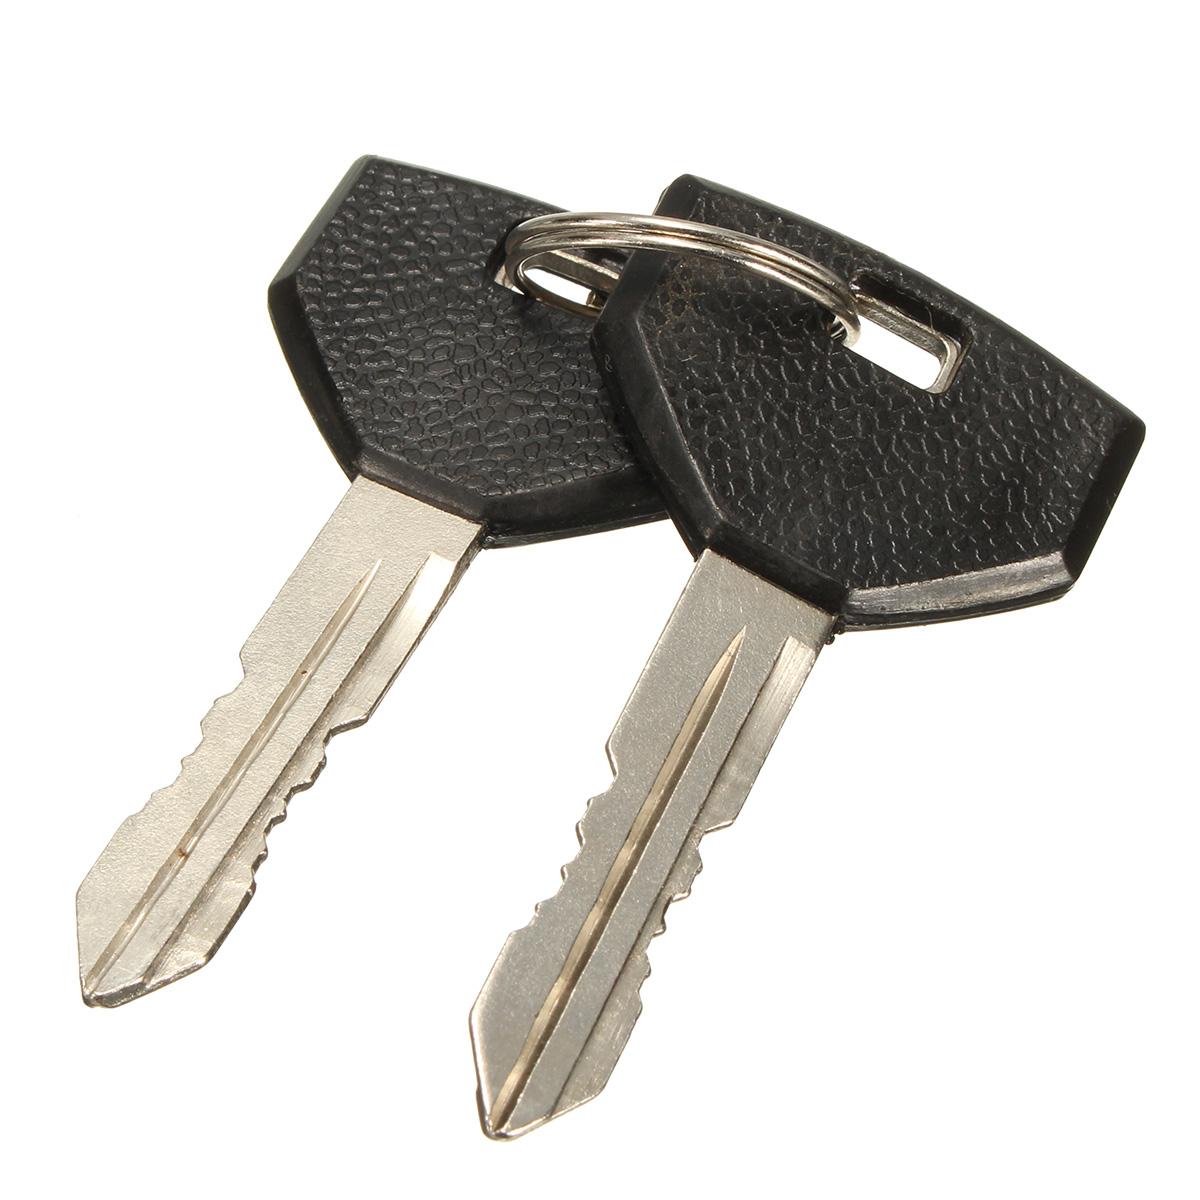 Ignition key switch lock cylinder with 2 key for chrysler dodge jeep lazada ph